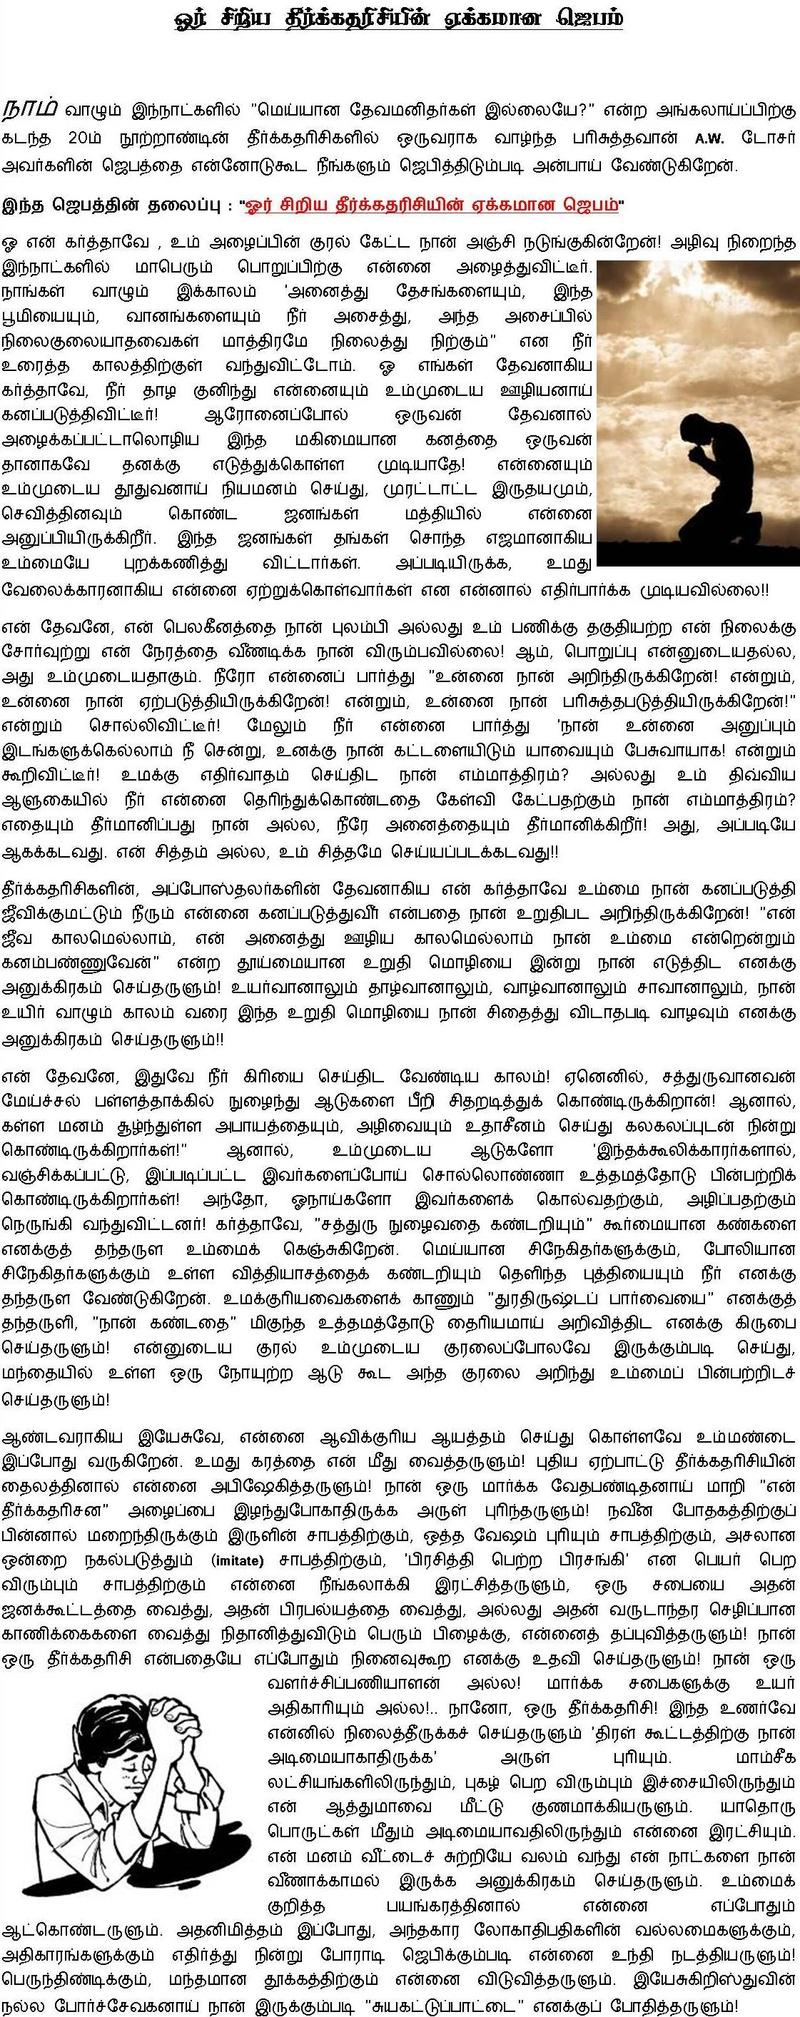 prophets prayer   tamil christian website